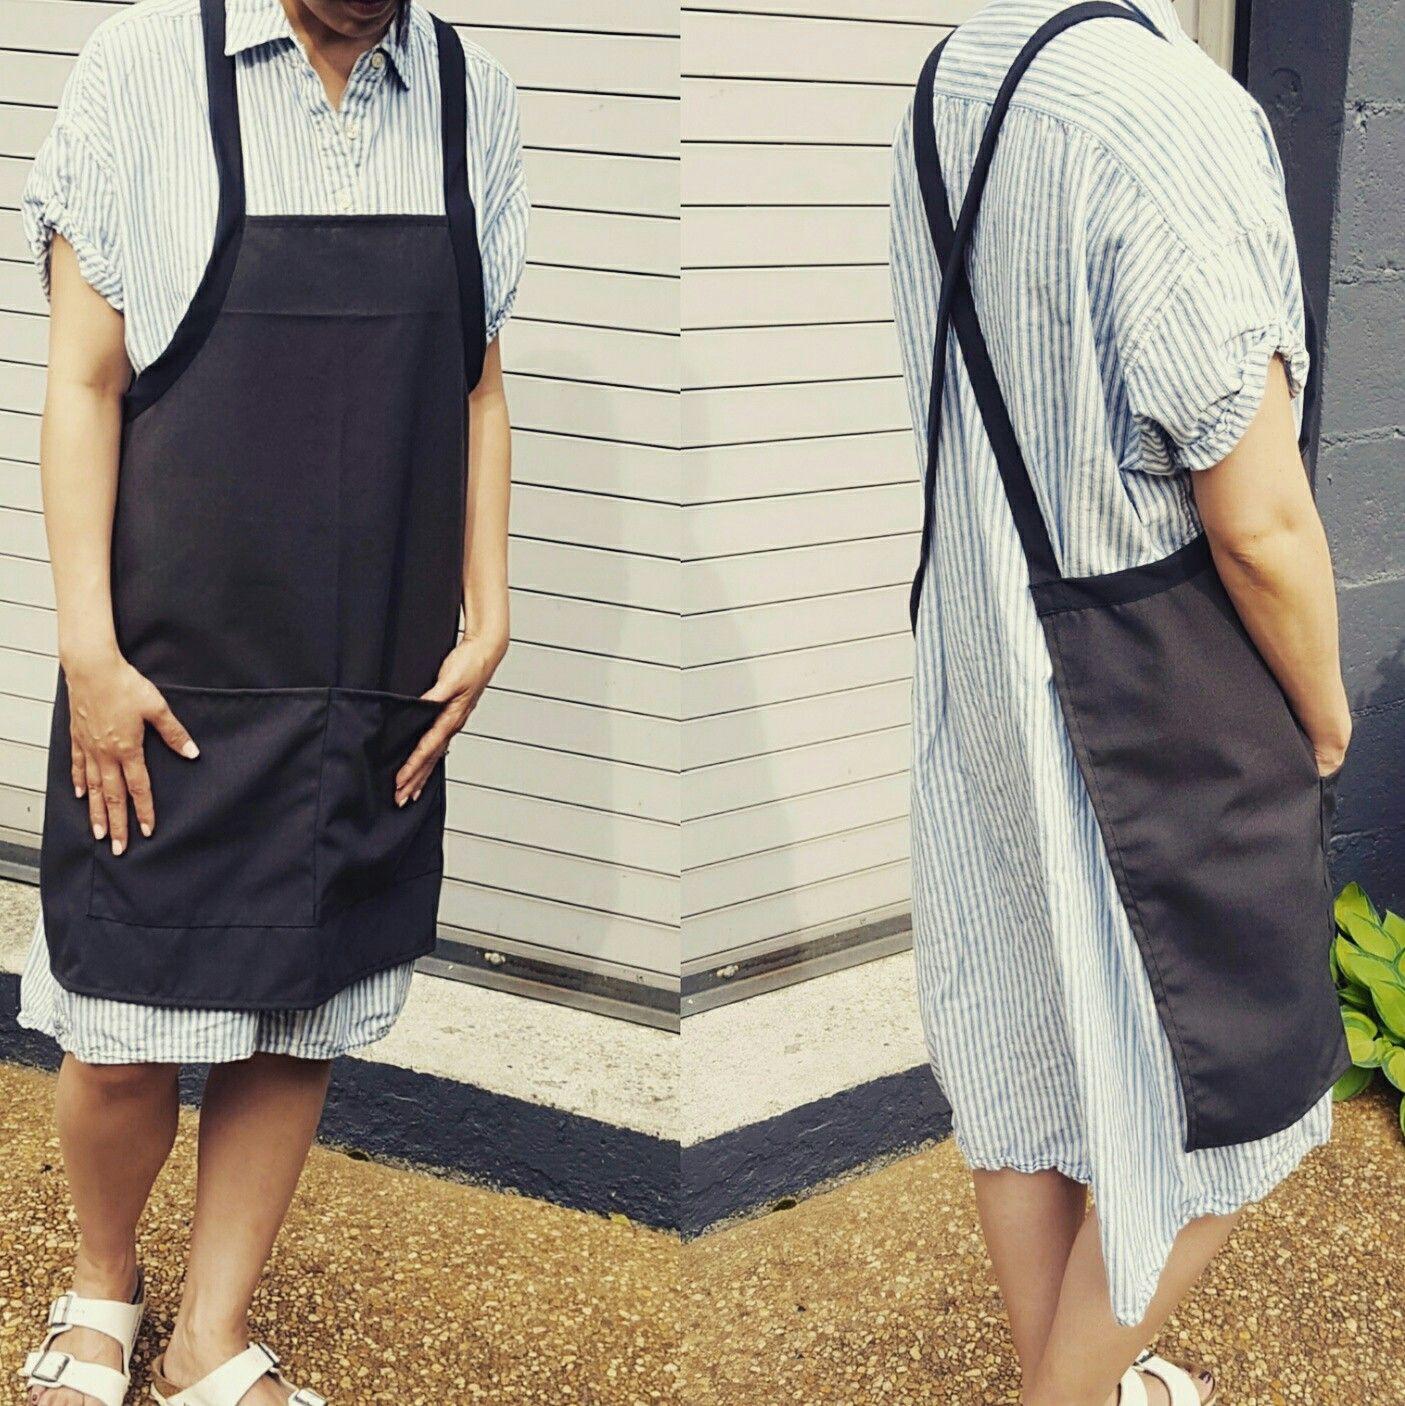 No tie apron design by linensusa.net #uniform #apron #madeinamerica